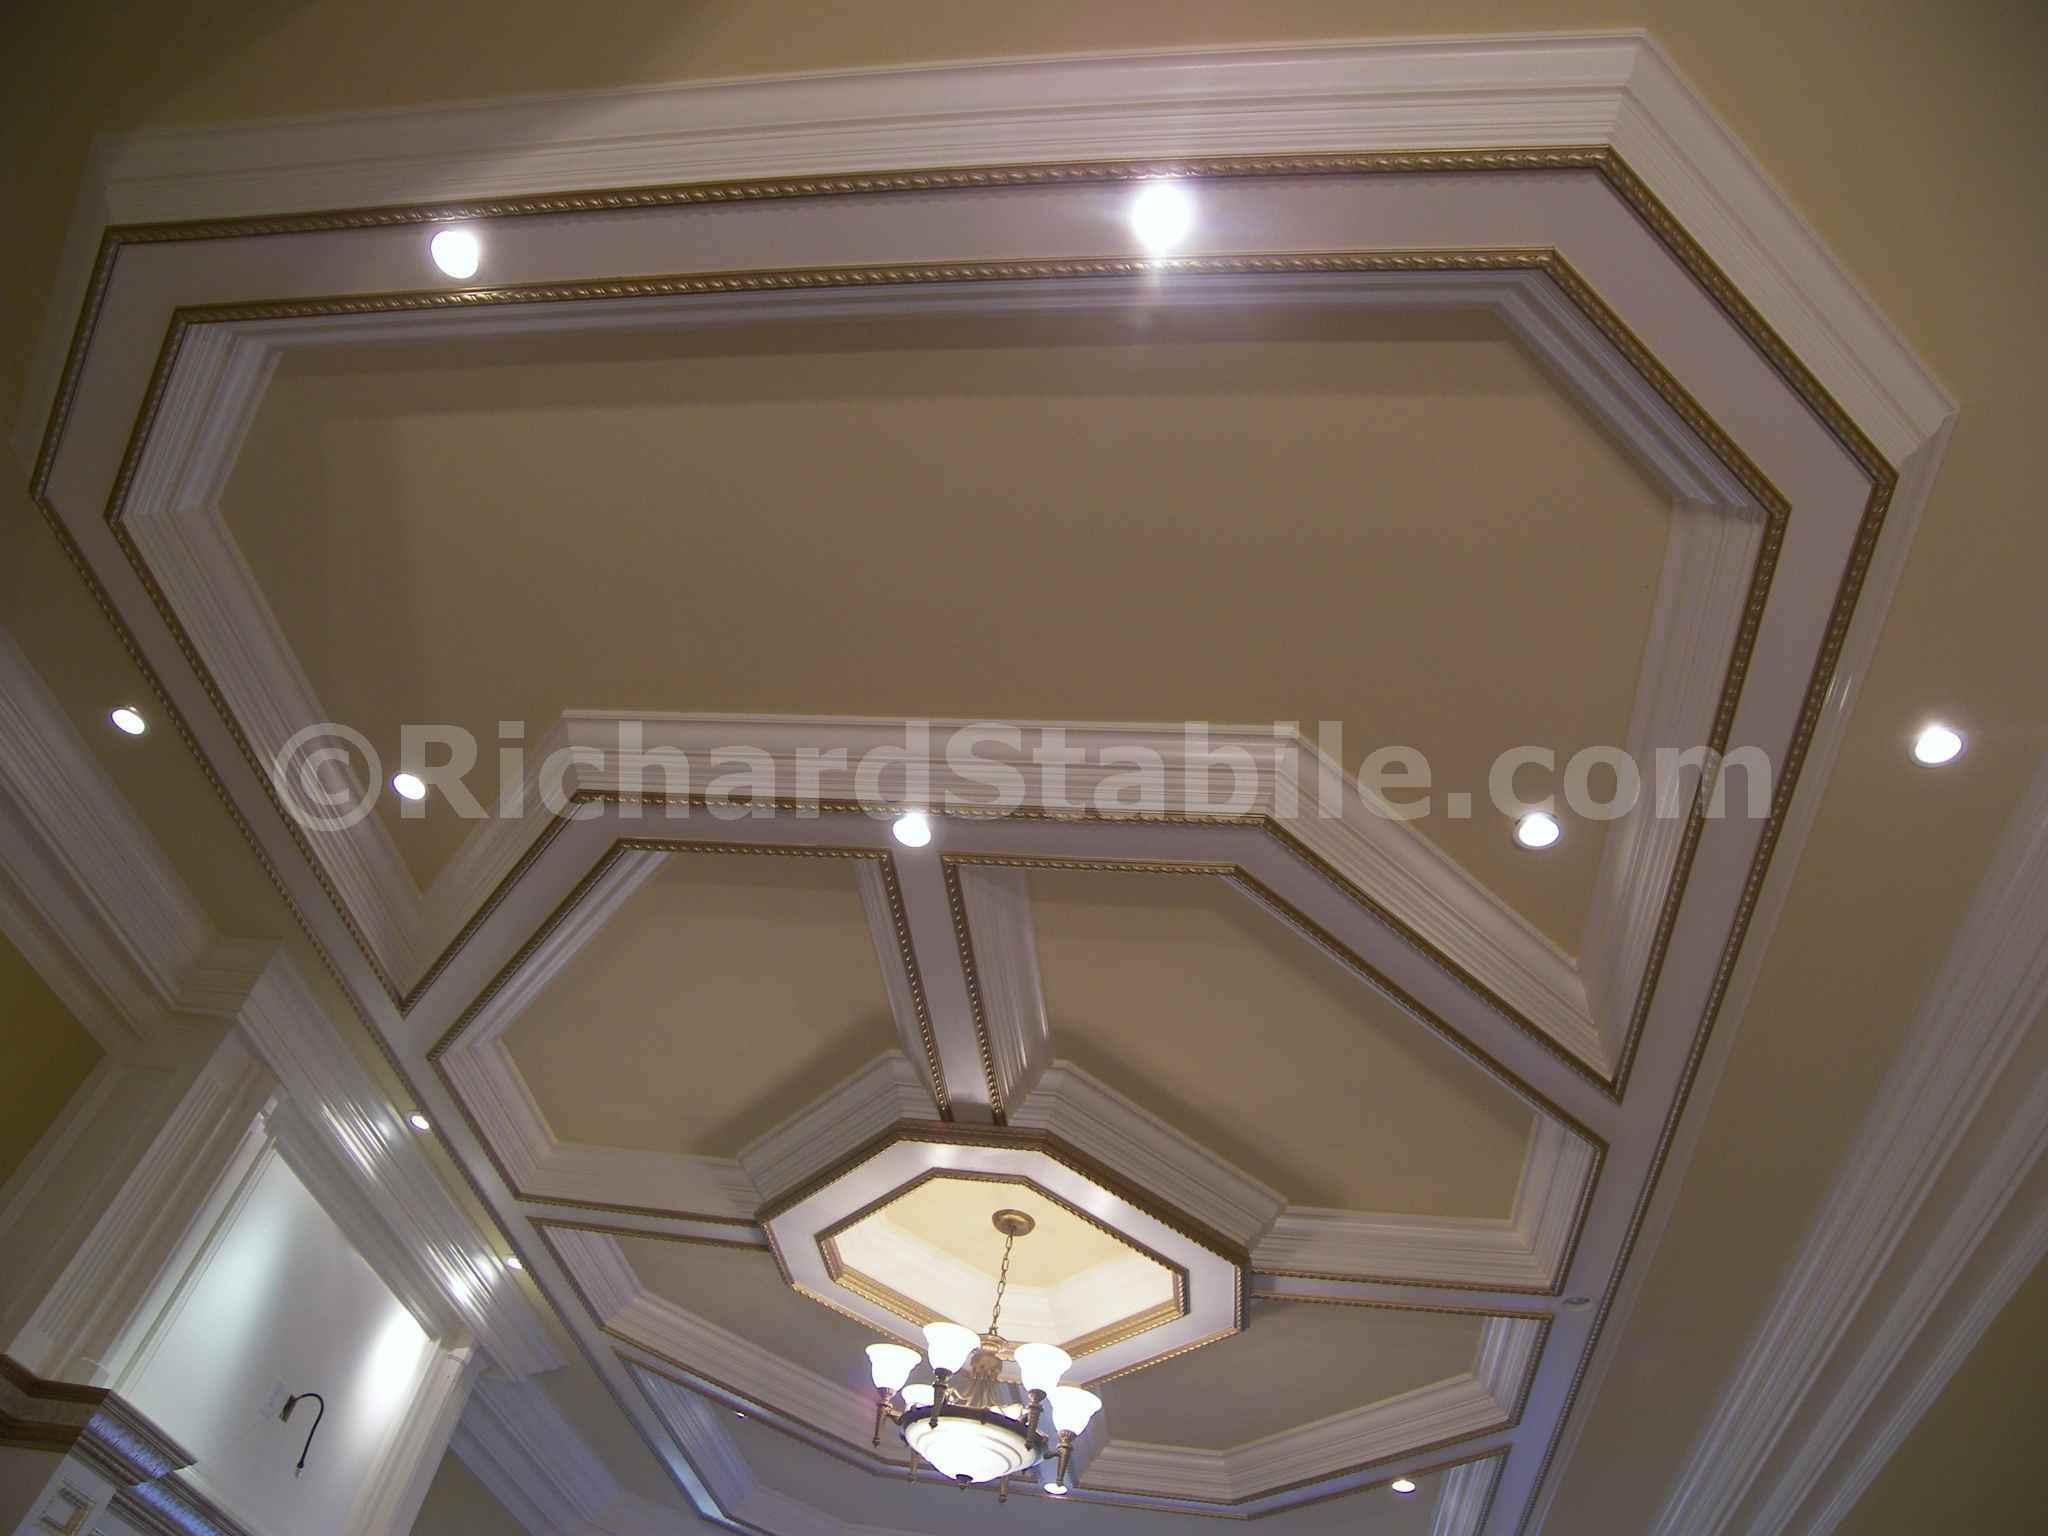 Saddle River Custom Ceiling